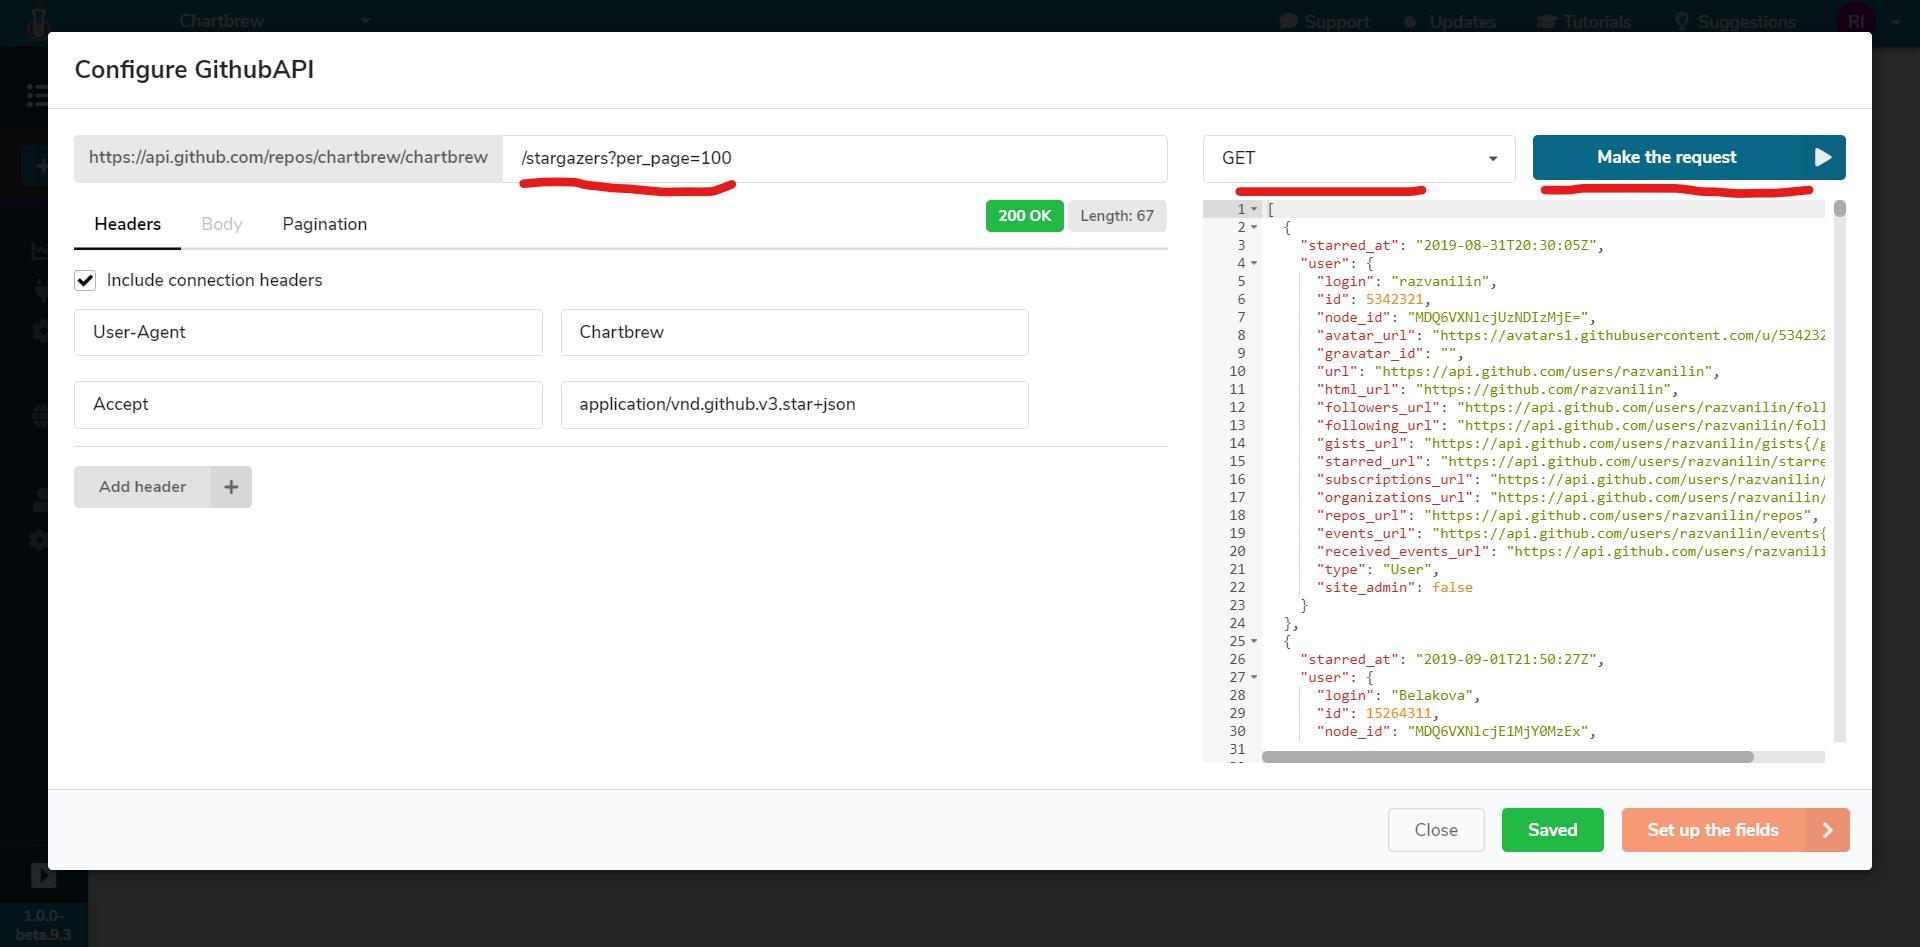 API request configuration in Chartbrew